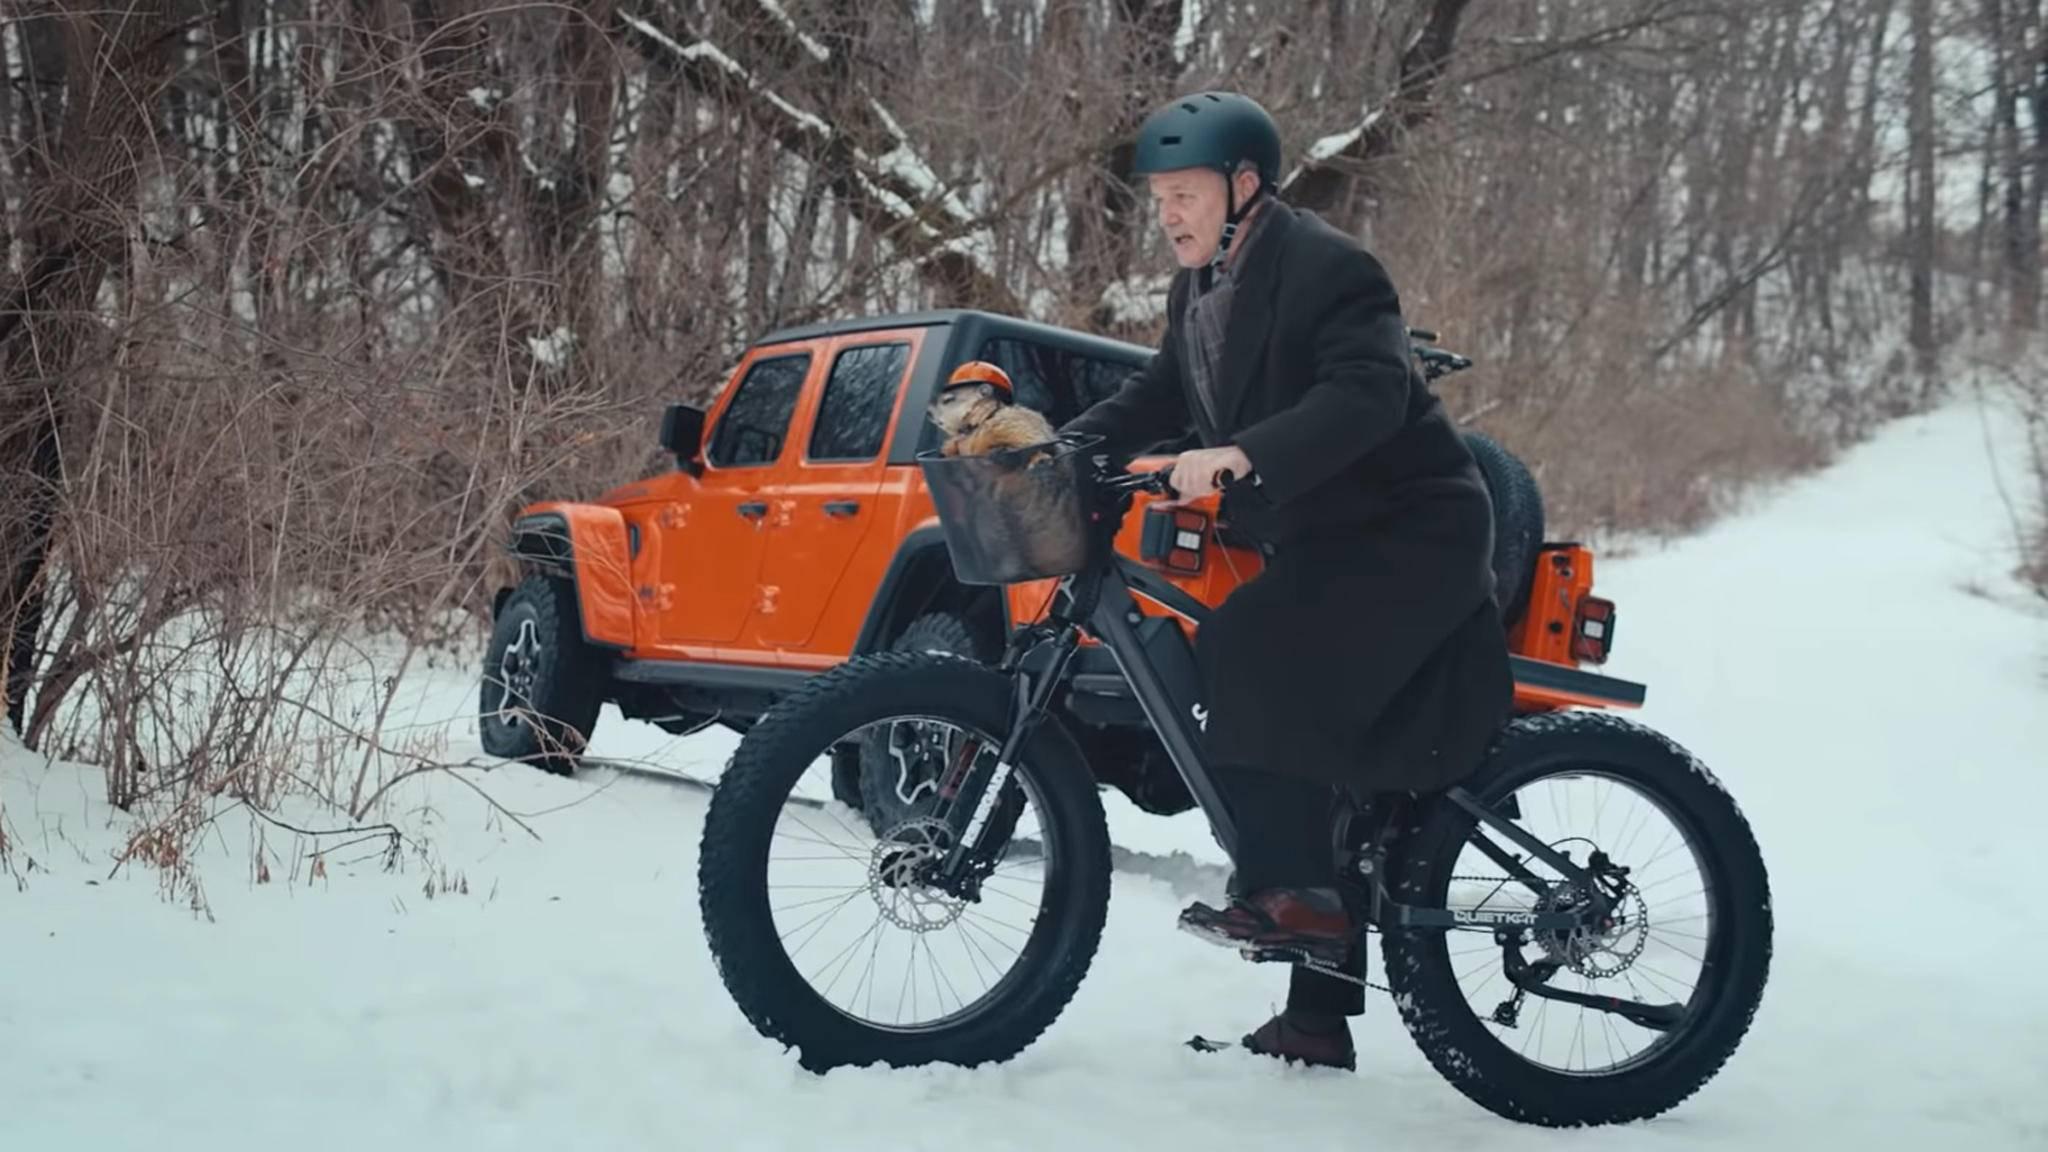 jeep e-bike bill-murray